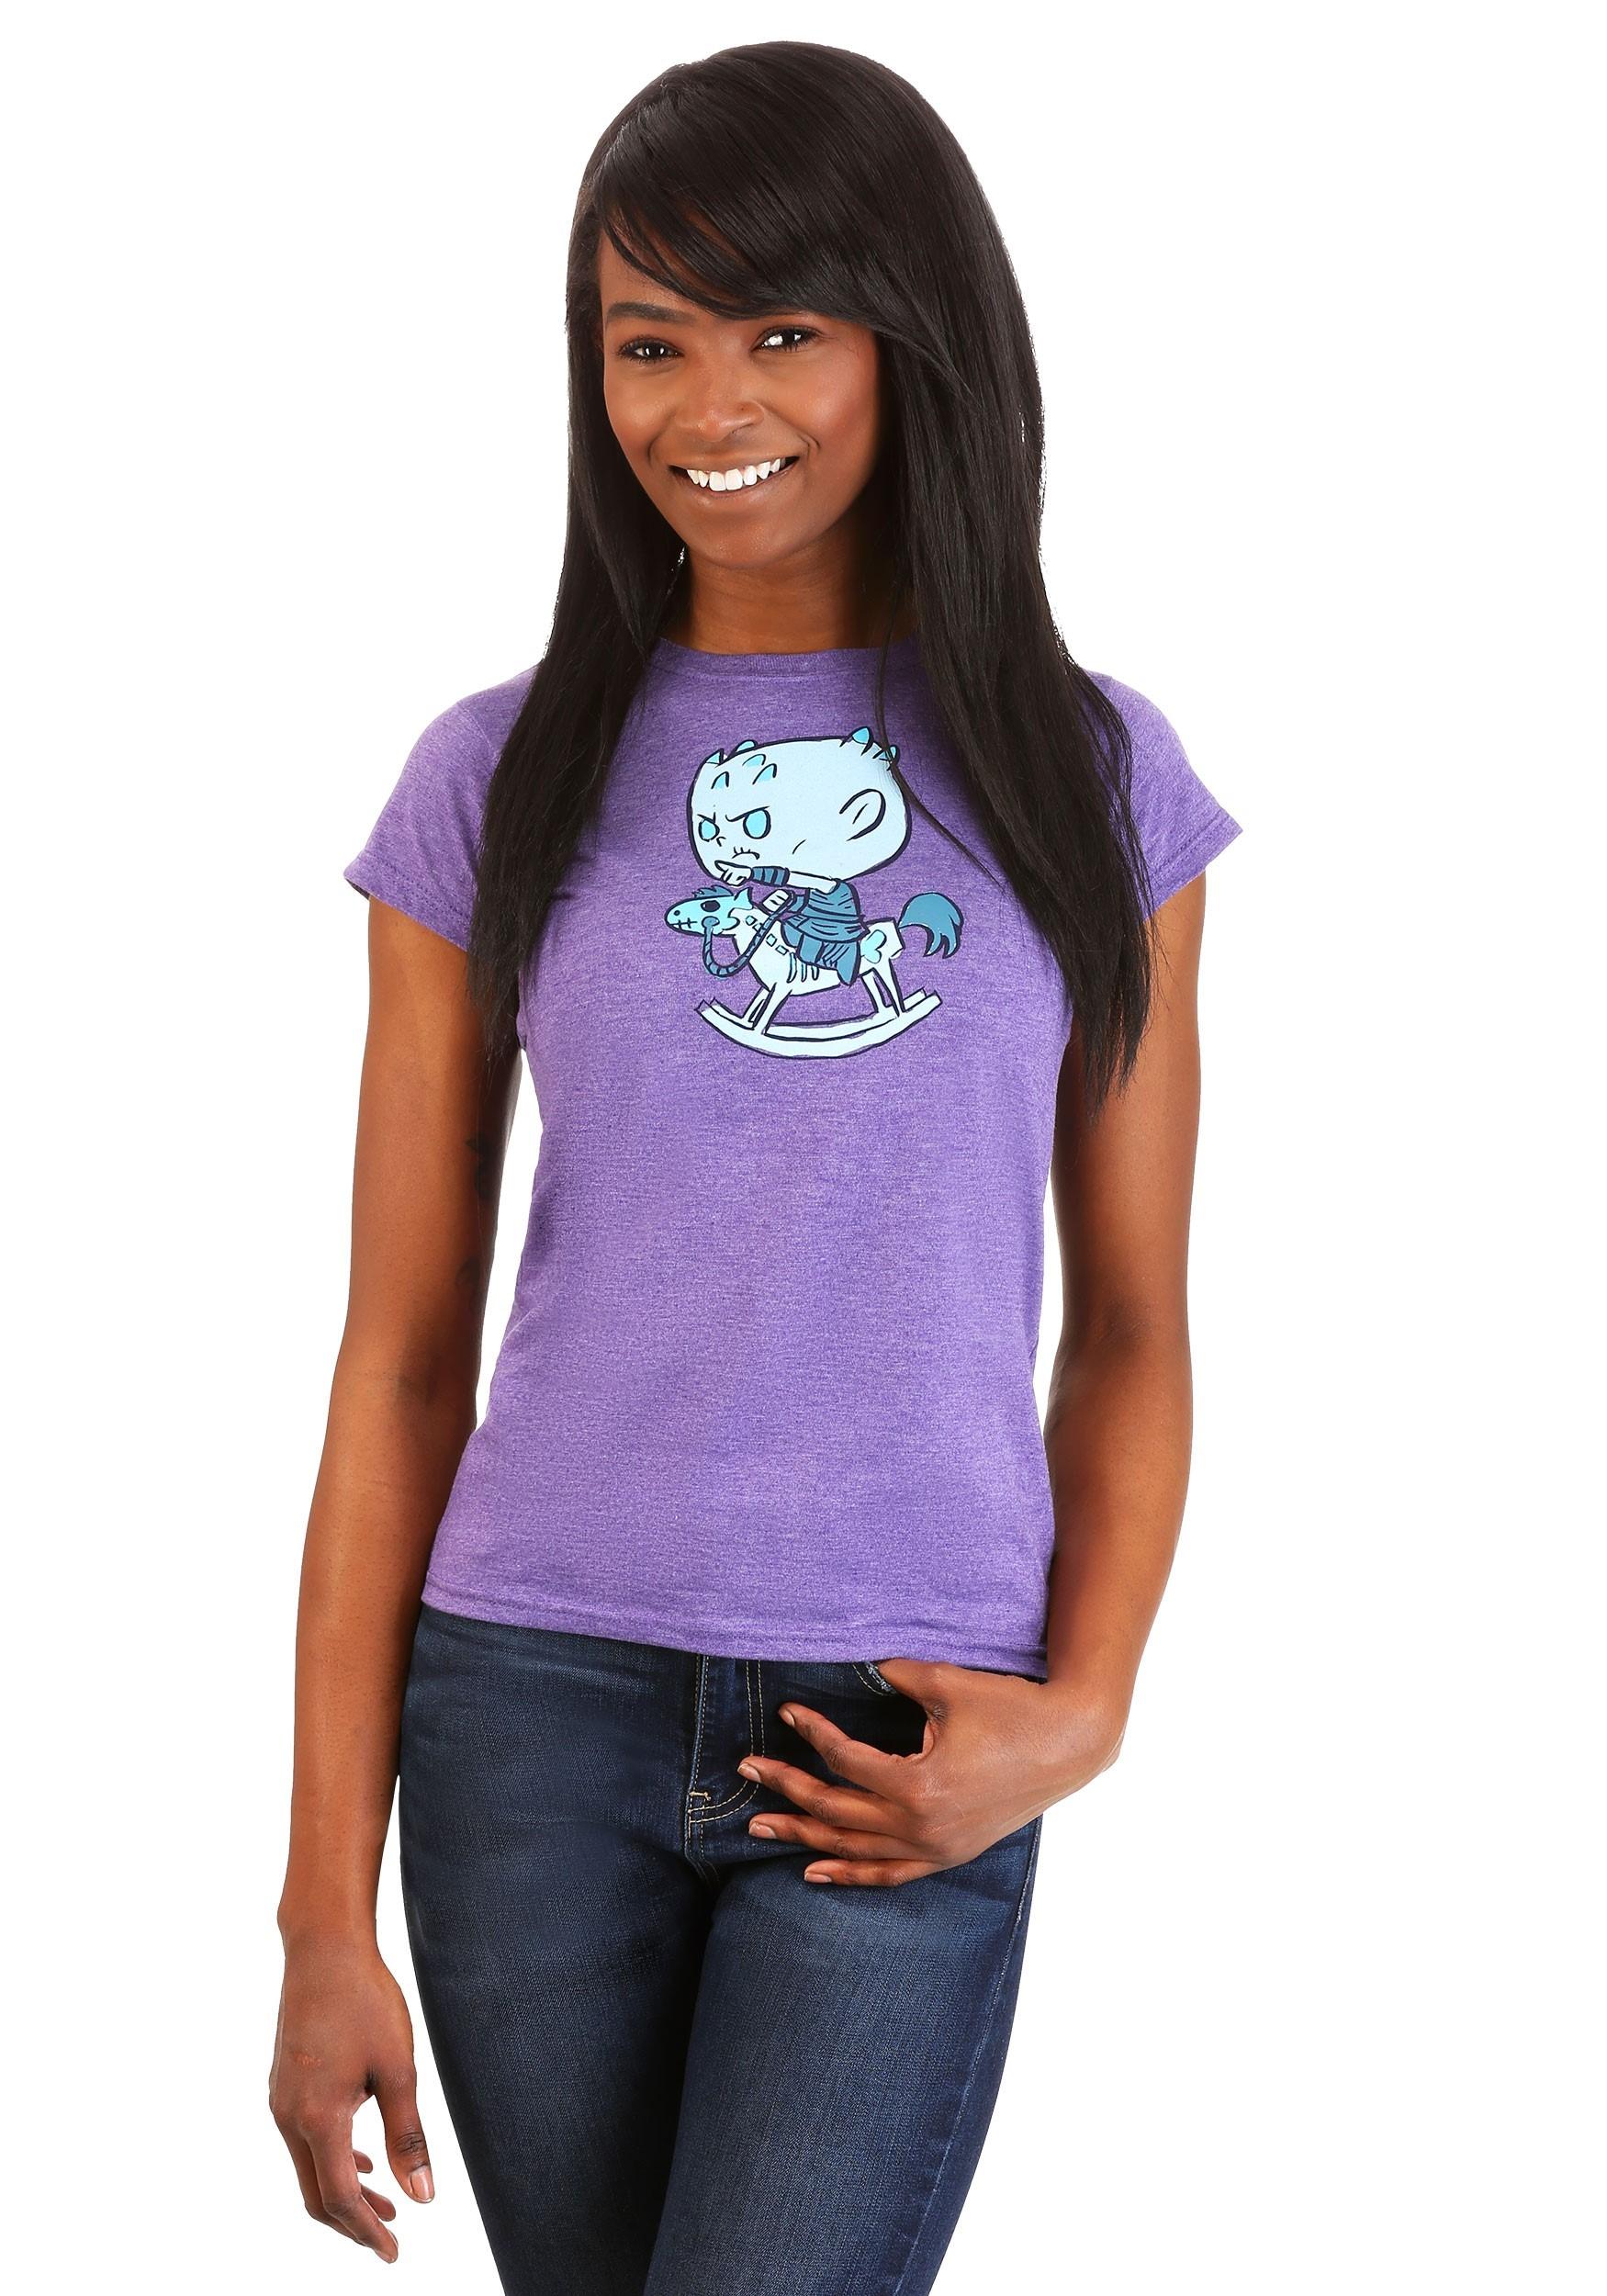 Funko Super Cute Tees: Game of Thrones Night King Horsey Purple Women's T-Shirt